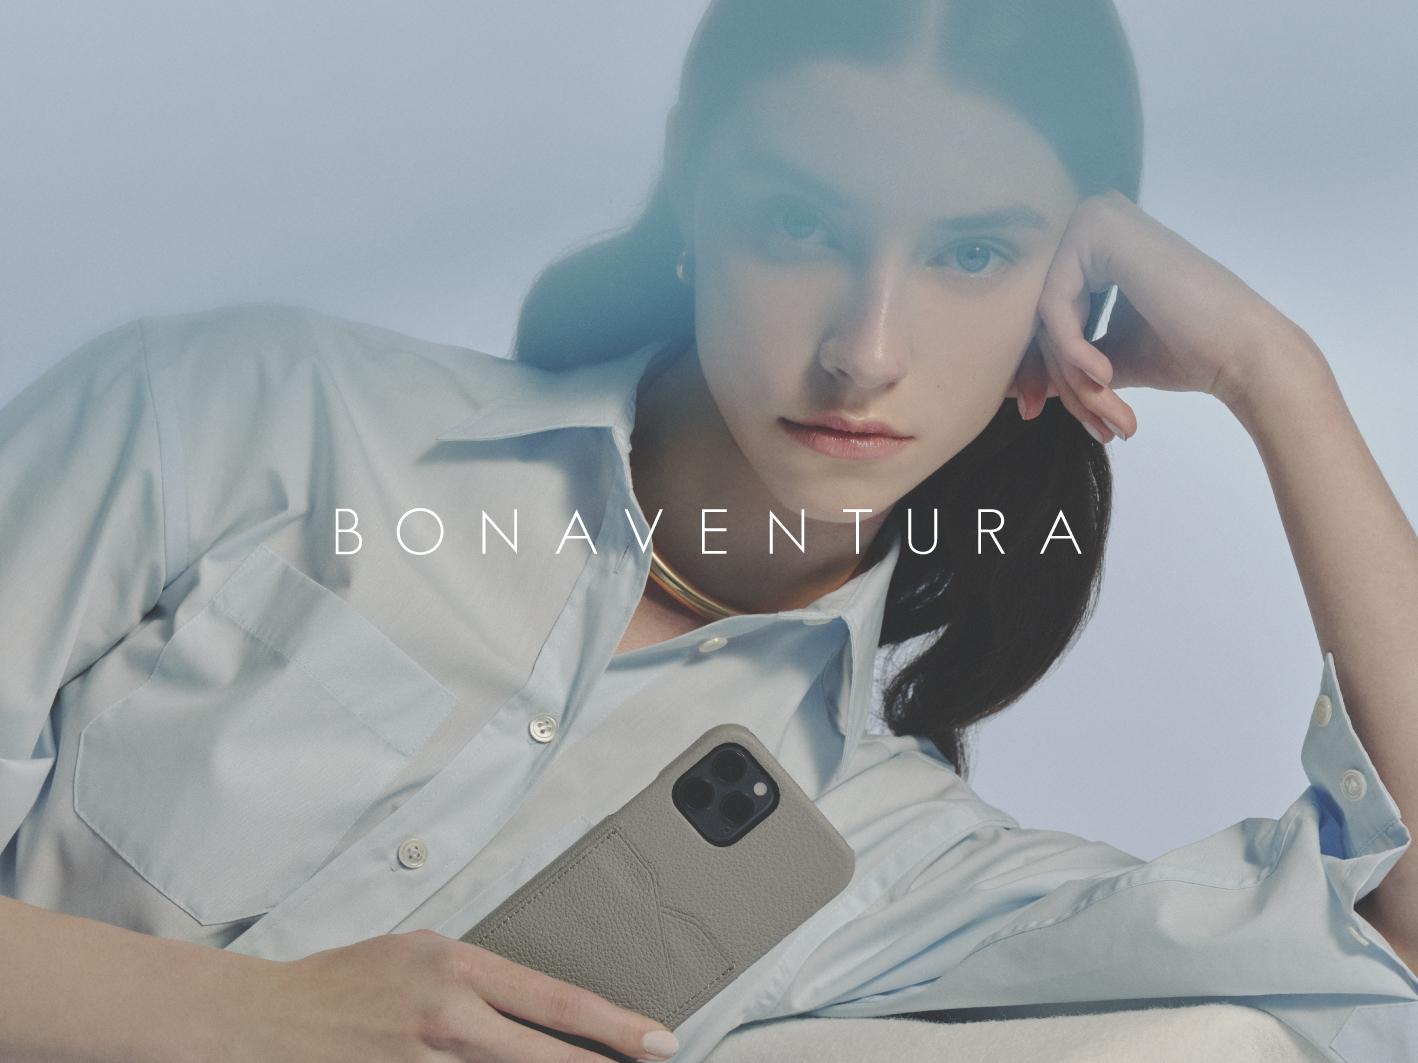 【WEBマーケティング】BONAVENTURA|経験者歓迎|東京のカバー写真